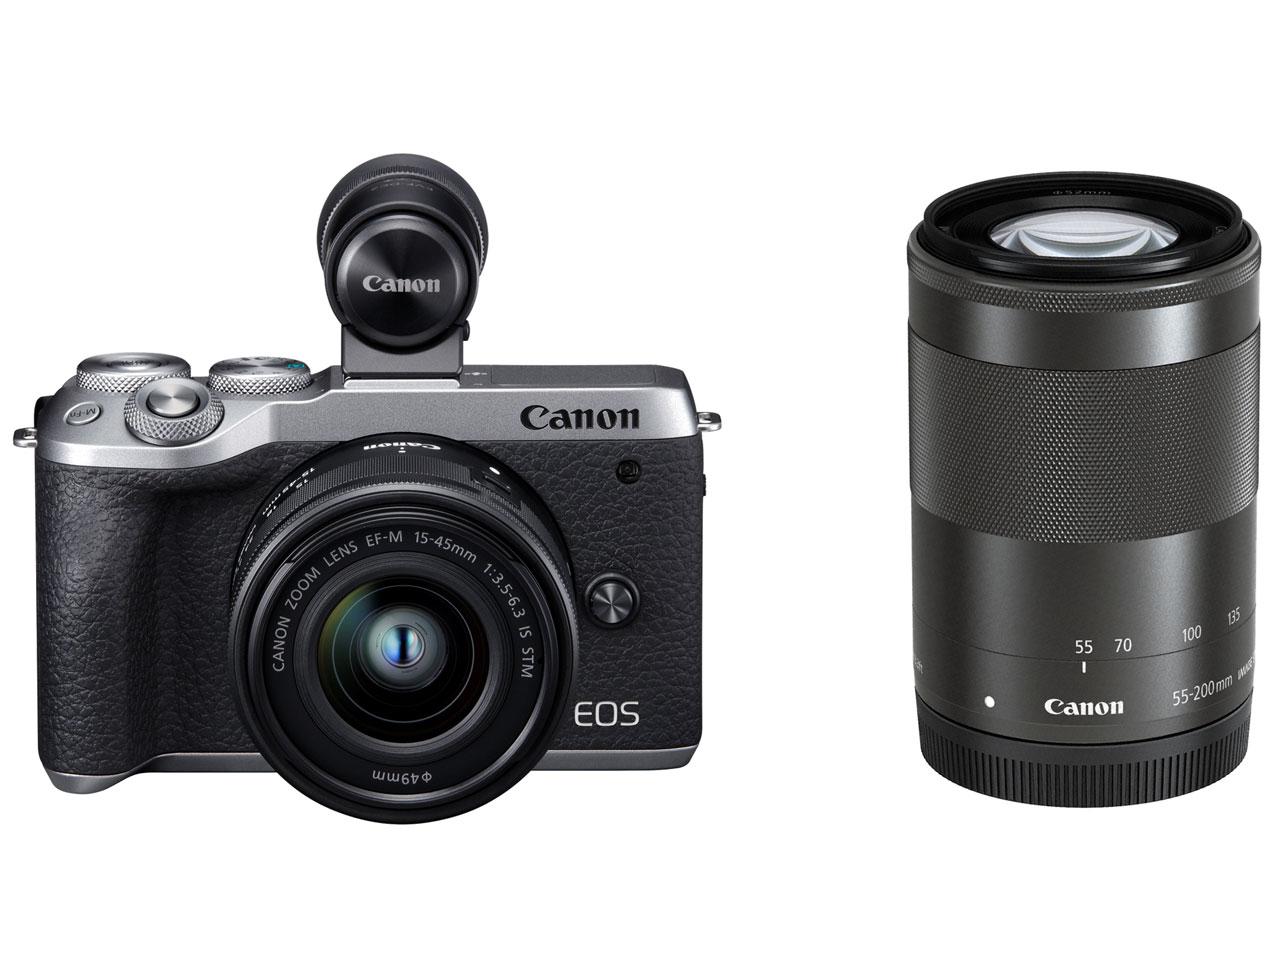 Canon EOS M6 Mark II ダブルズームEVFキット [シルバー]【お取り寄せ(メーカー取り寄せ/予約受付中)】※1~2ヶ月